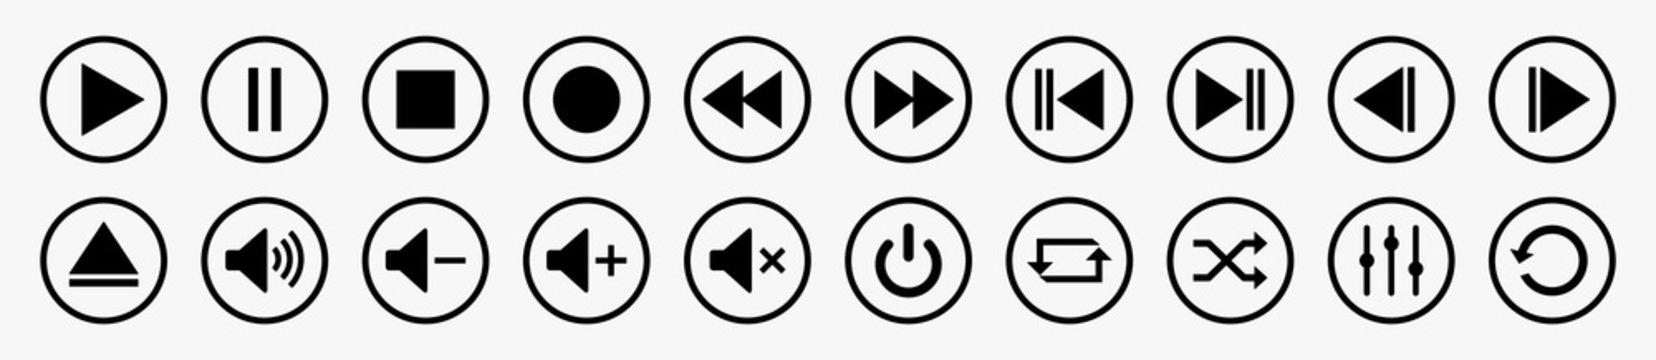 Media player control icon set, multimedia symbols and audio – stock vector